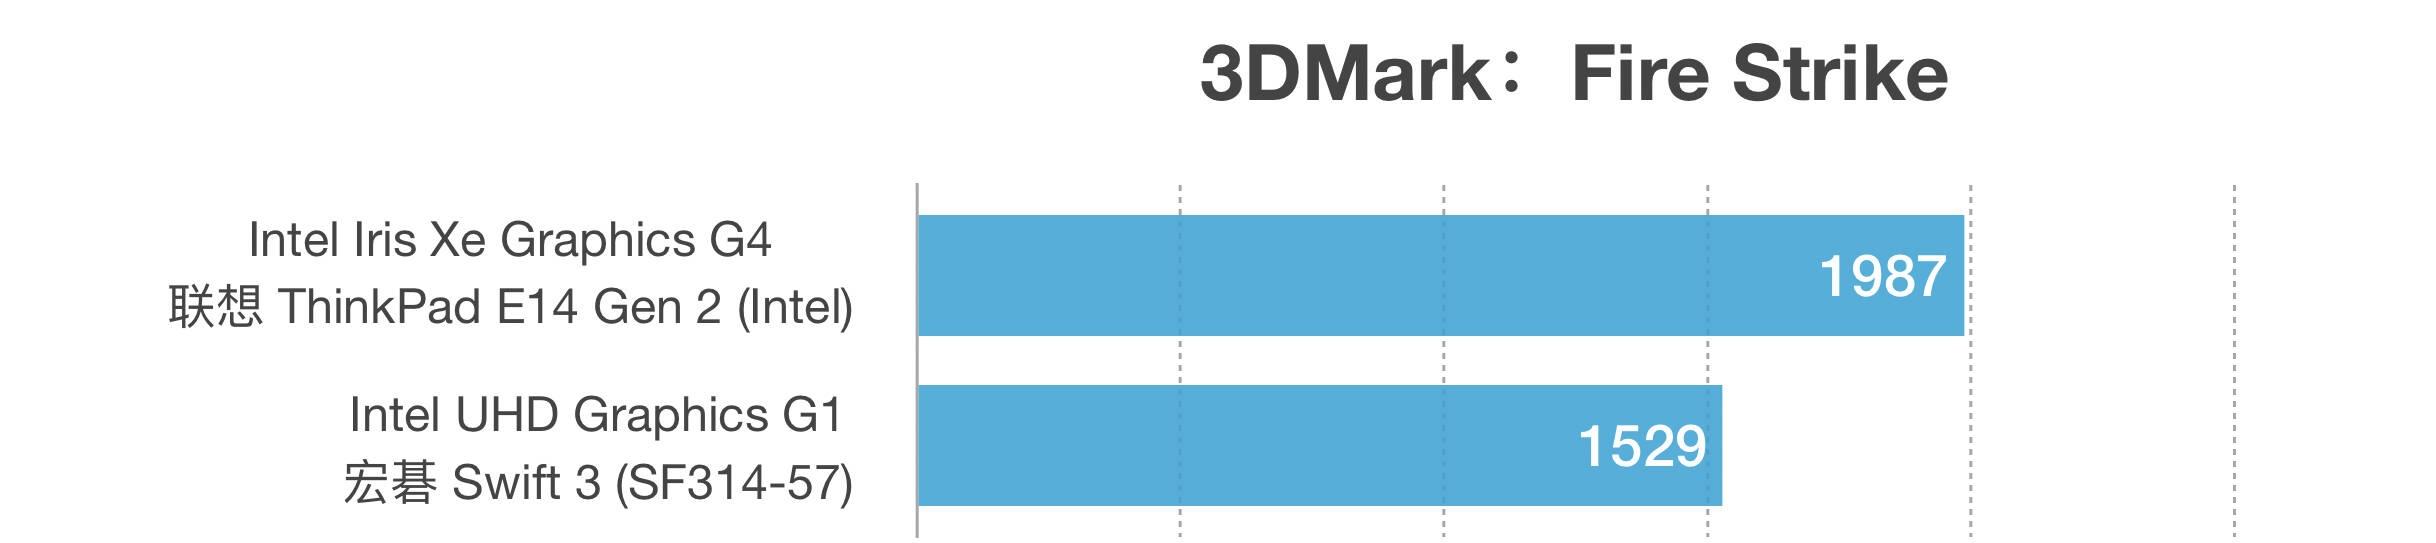 Intel Core i3-1115G4和i3-1005G1性能跑分对比评测